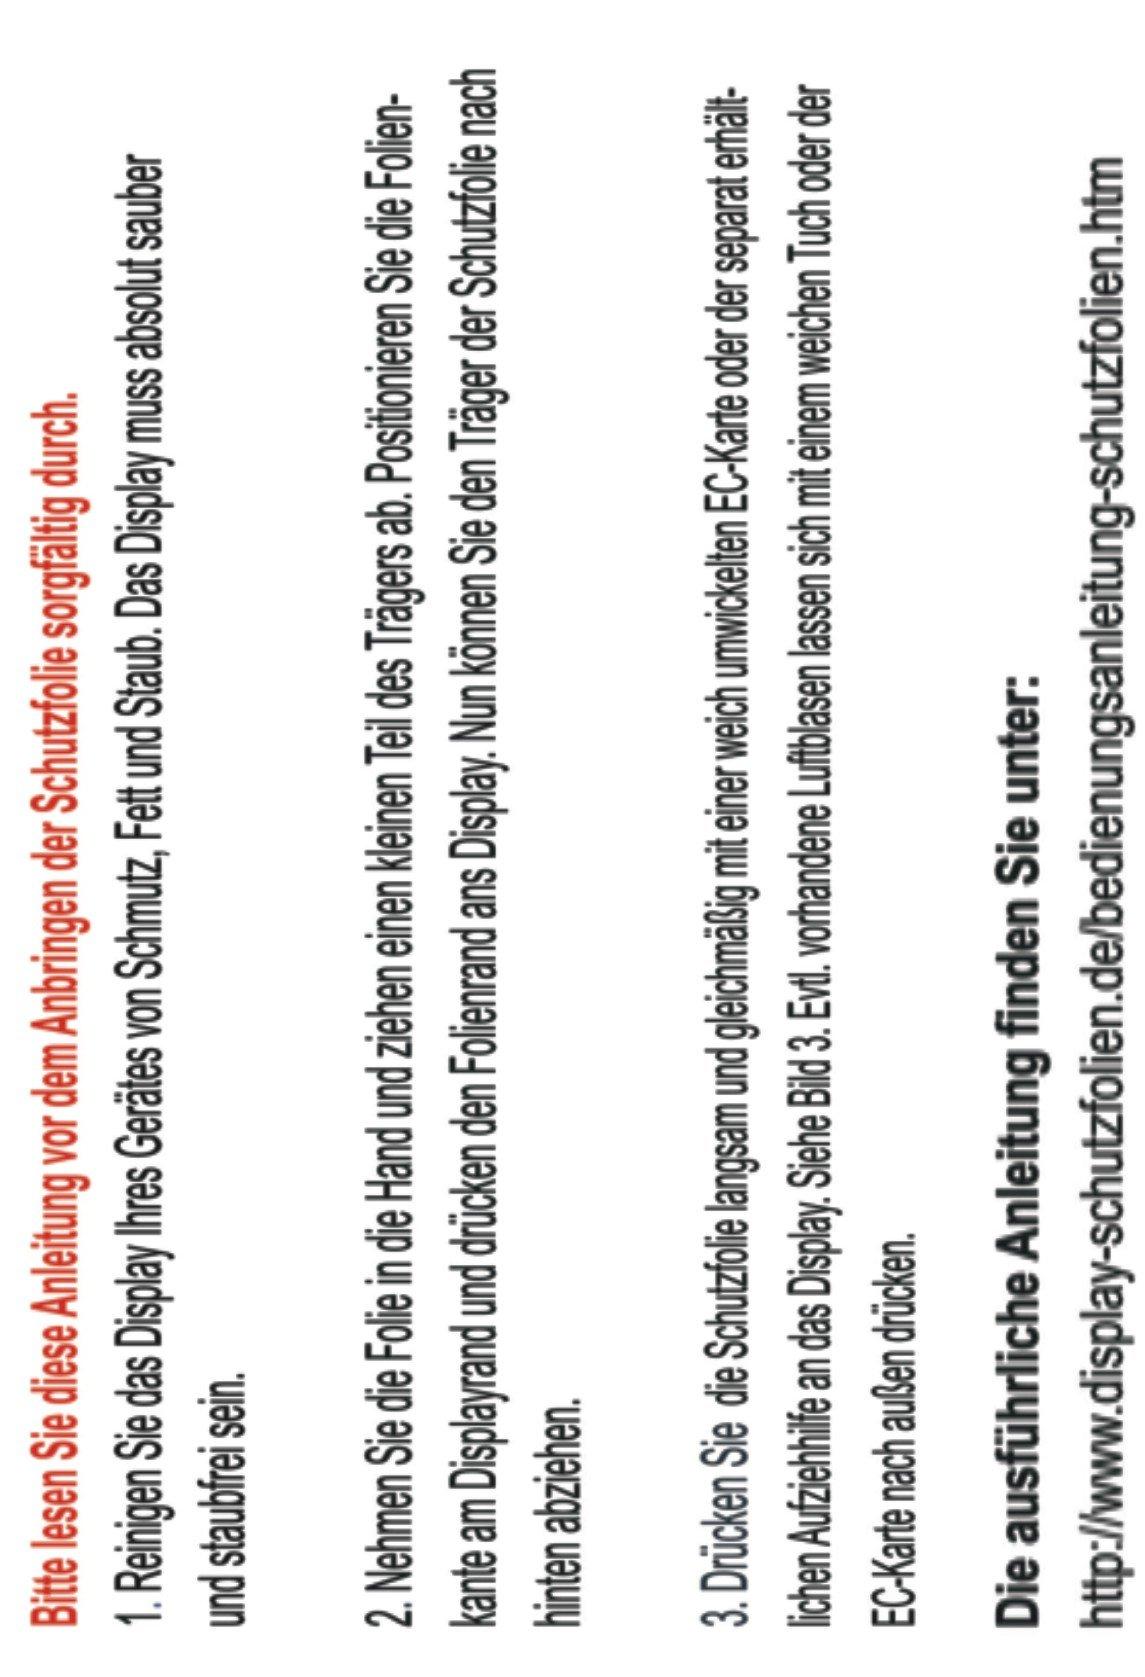 2X-Crystal-Clear-klar-Schutzfolie-fr-Siemens-TI-9555-X-1-X1-Kaffeevollautomat-Displayschutzfolie-Bildschirmschutzfolie-Schutzhlle-Displayschutz-Displayfolie-Folie